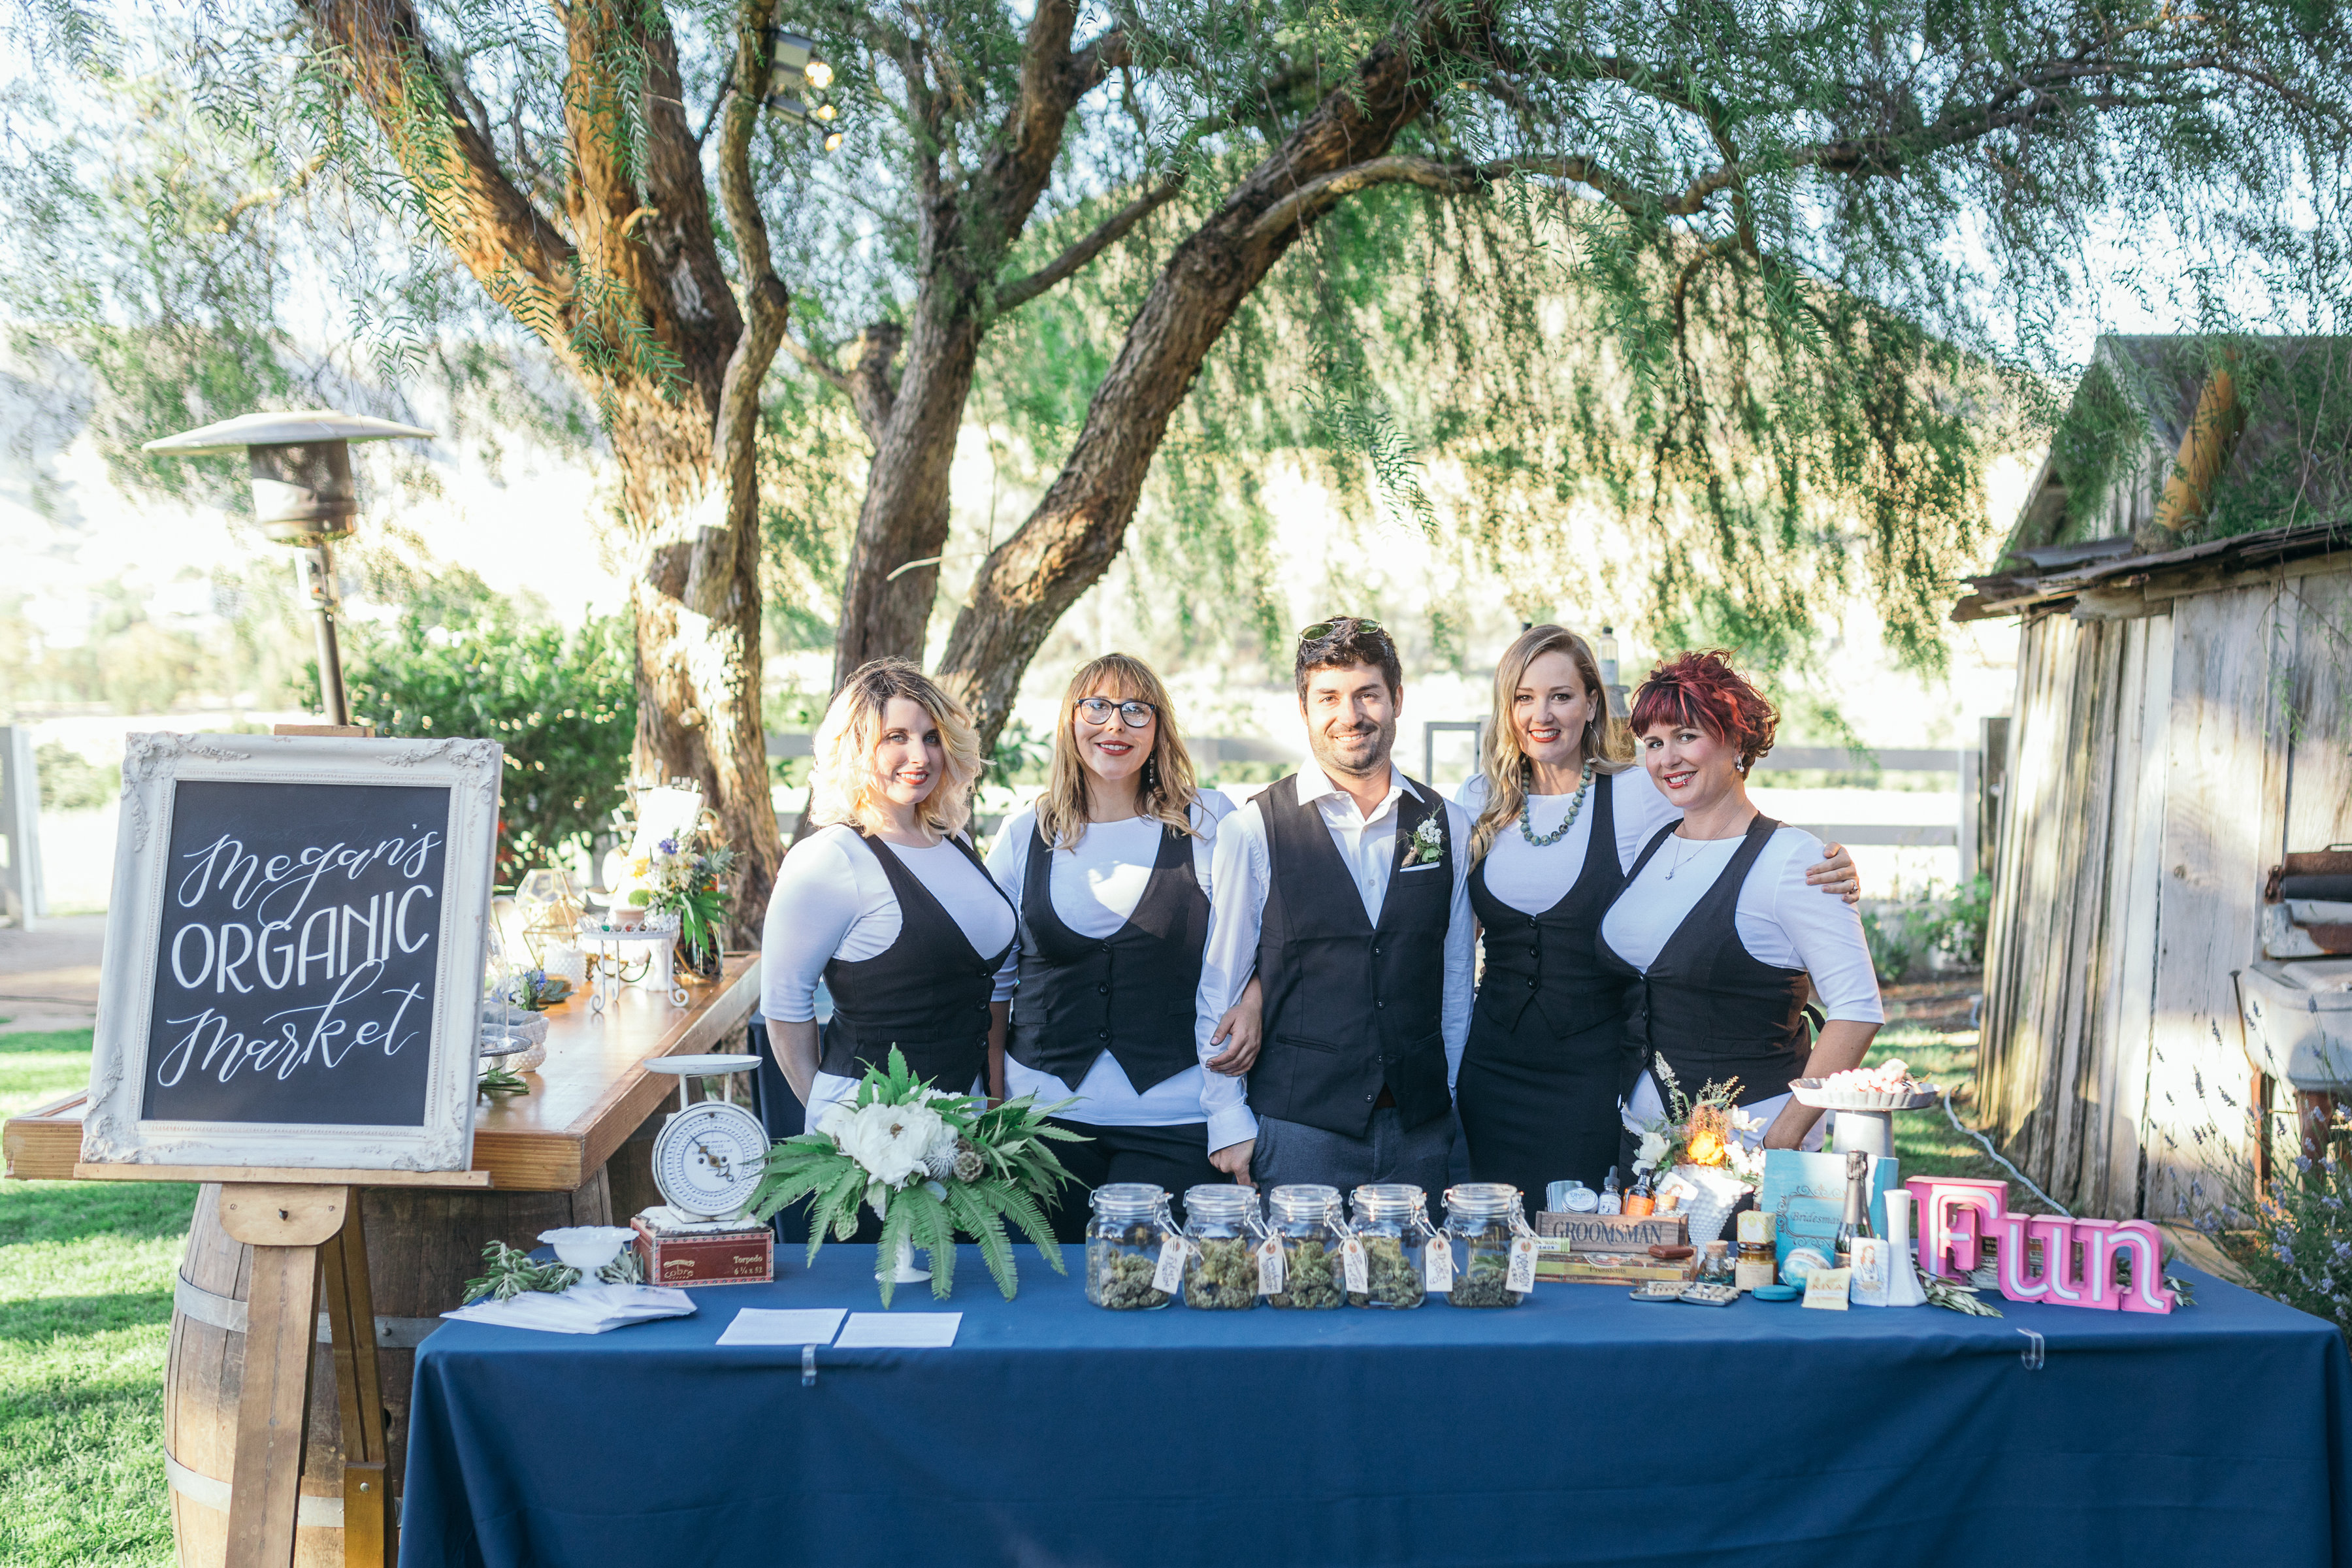 Budtenders - Megan's Organic Market